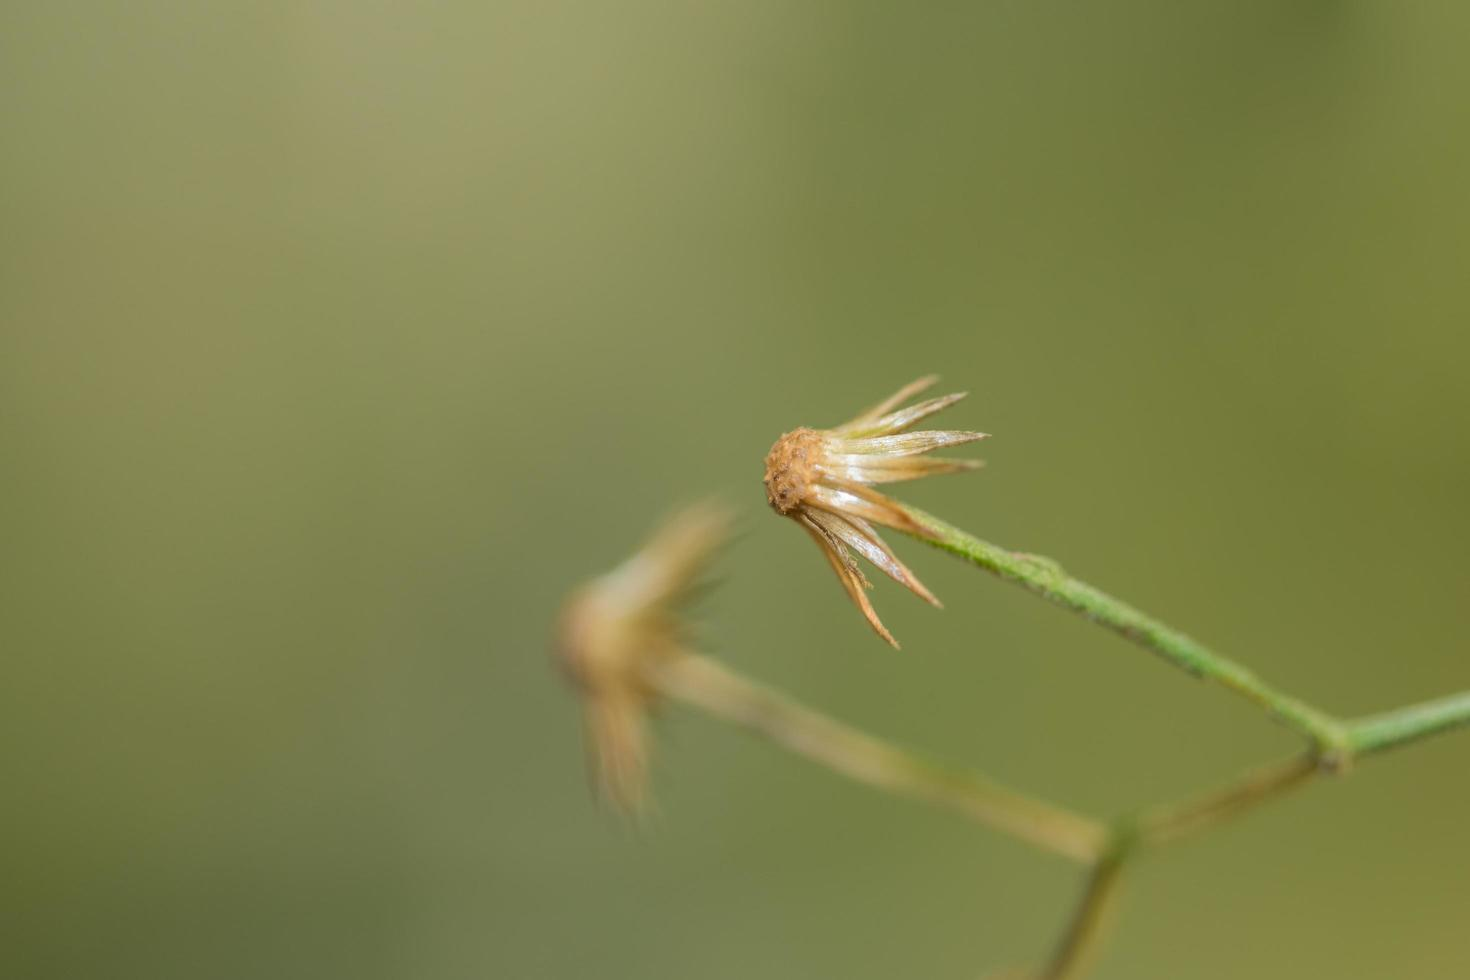 wilde Blume Nahaufnahme foto